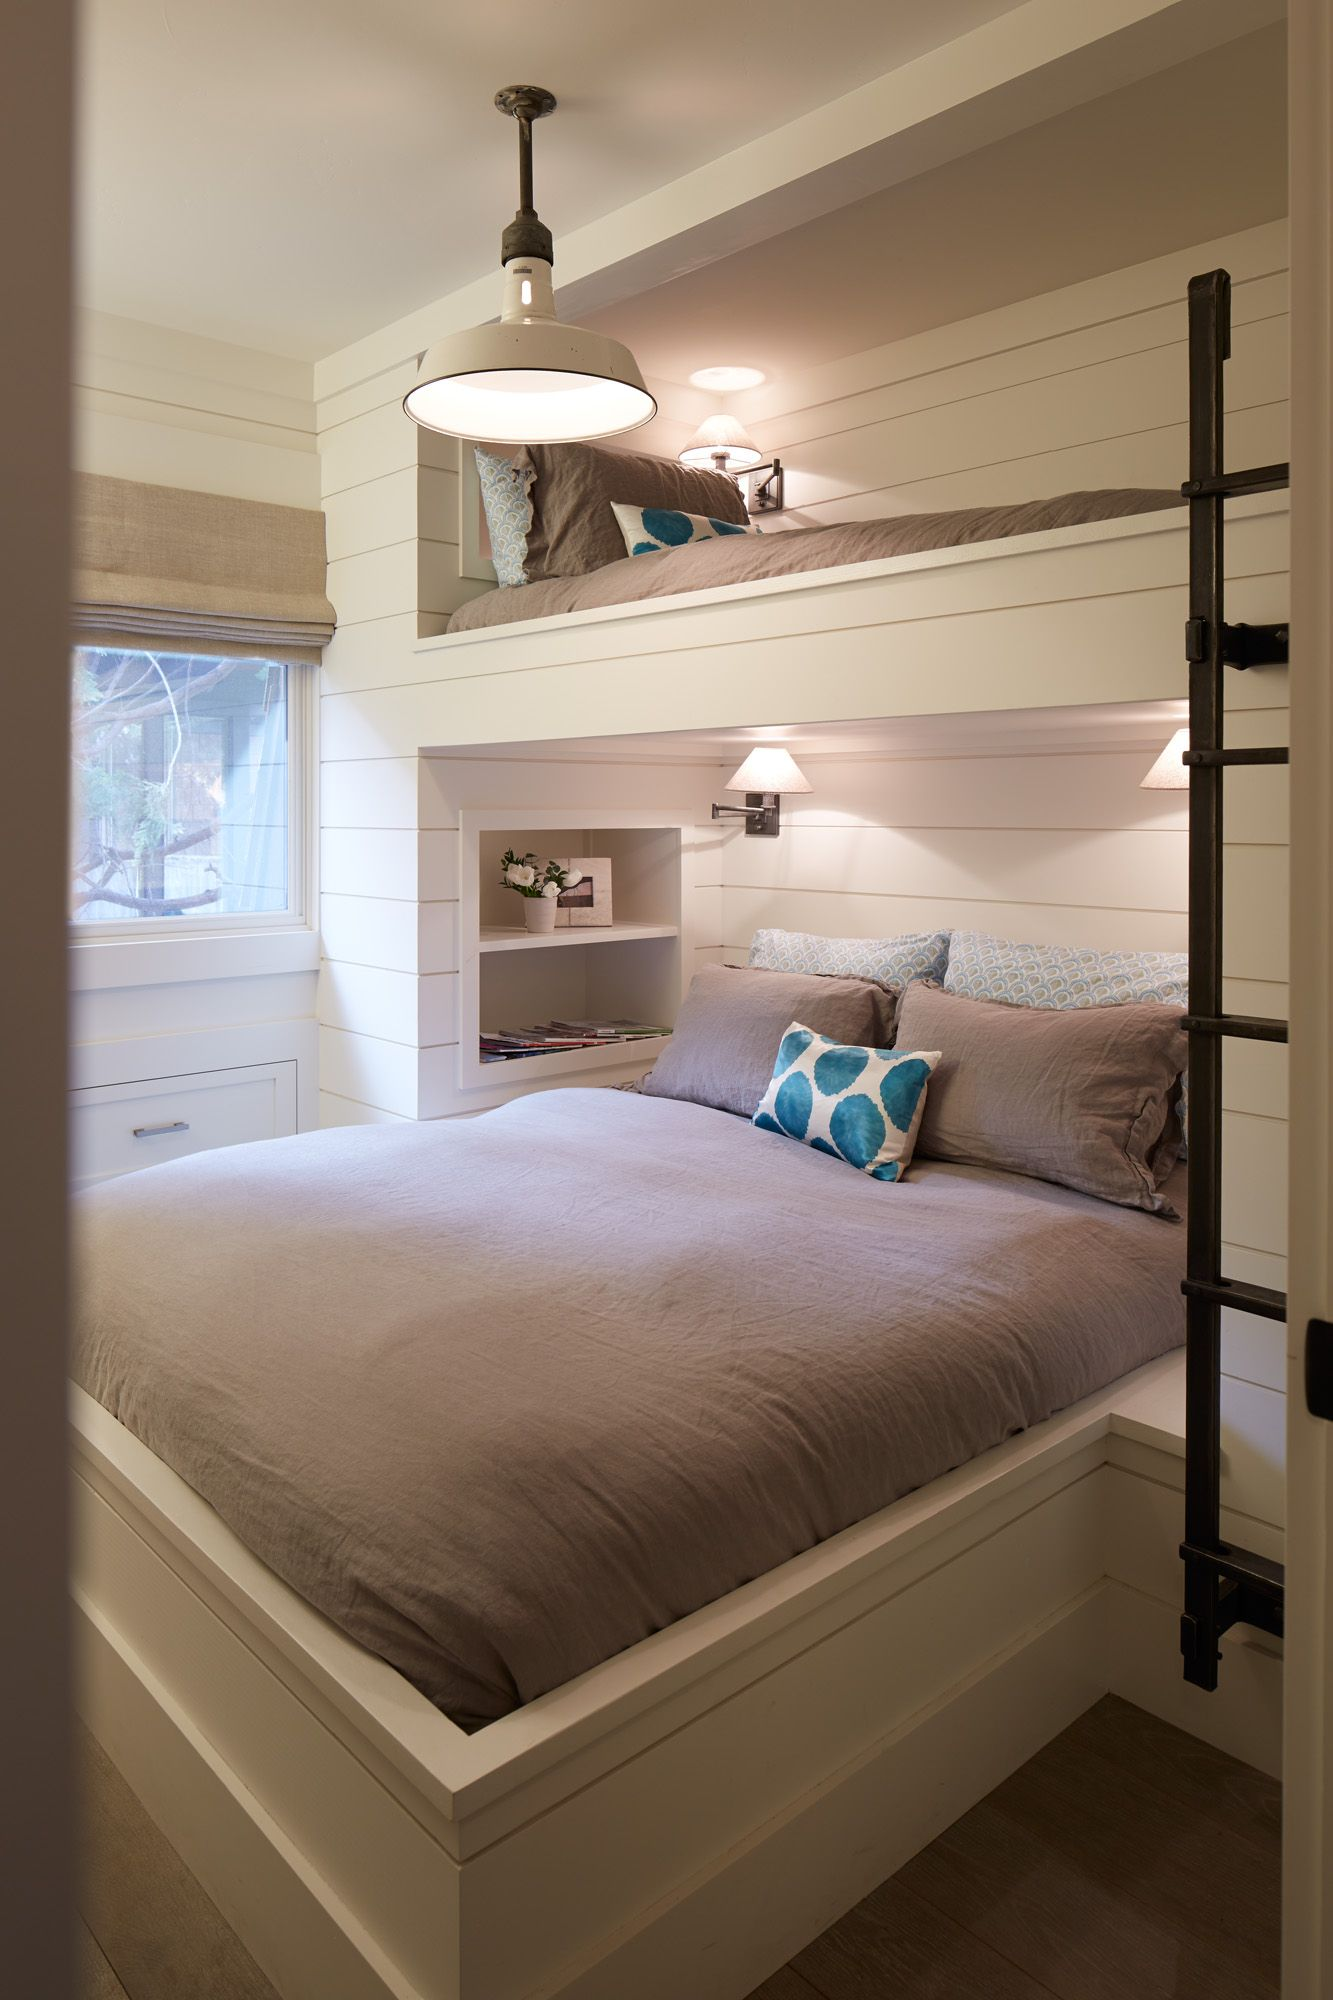 Boys loft bedroom ideas  Home  ADL Interior Designer San Francisco  Kidsu Rooms